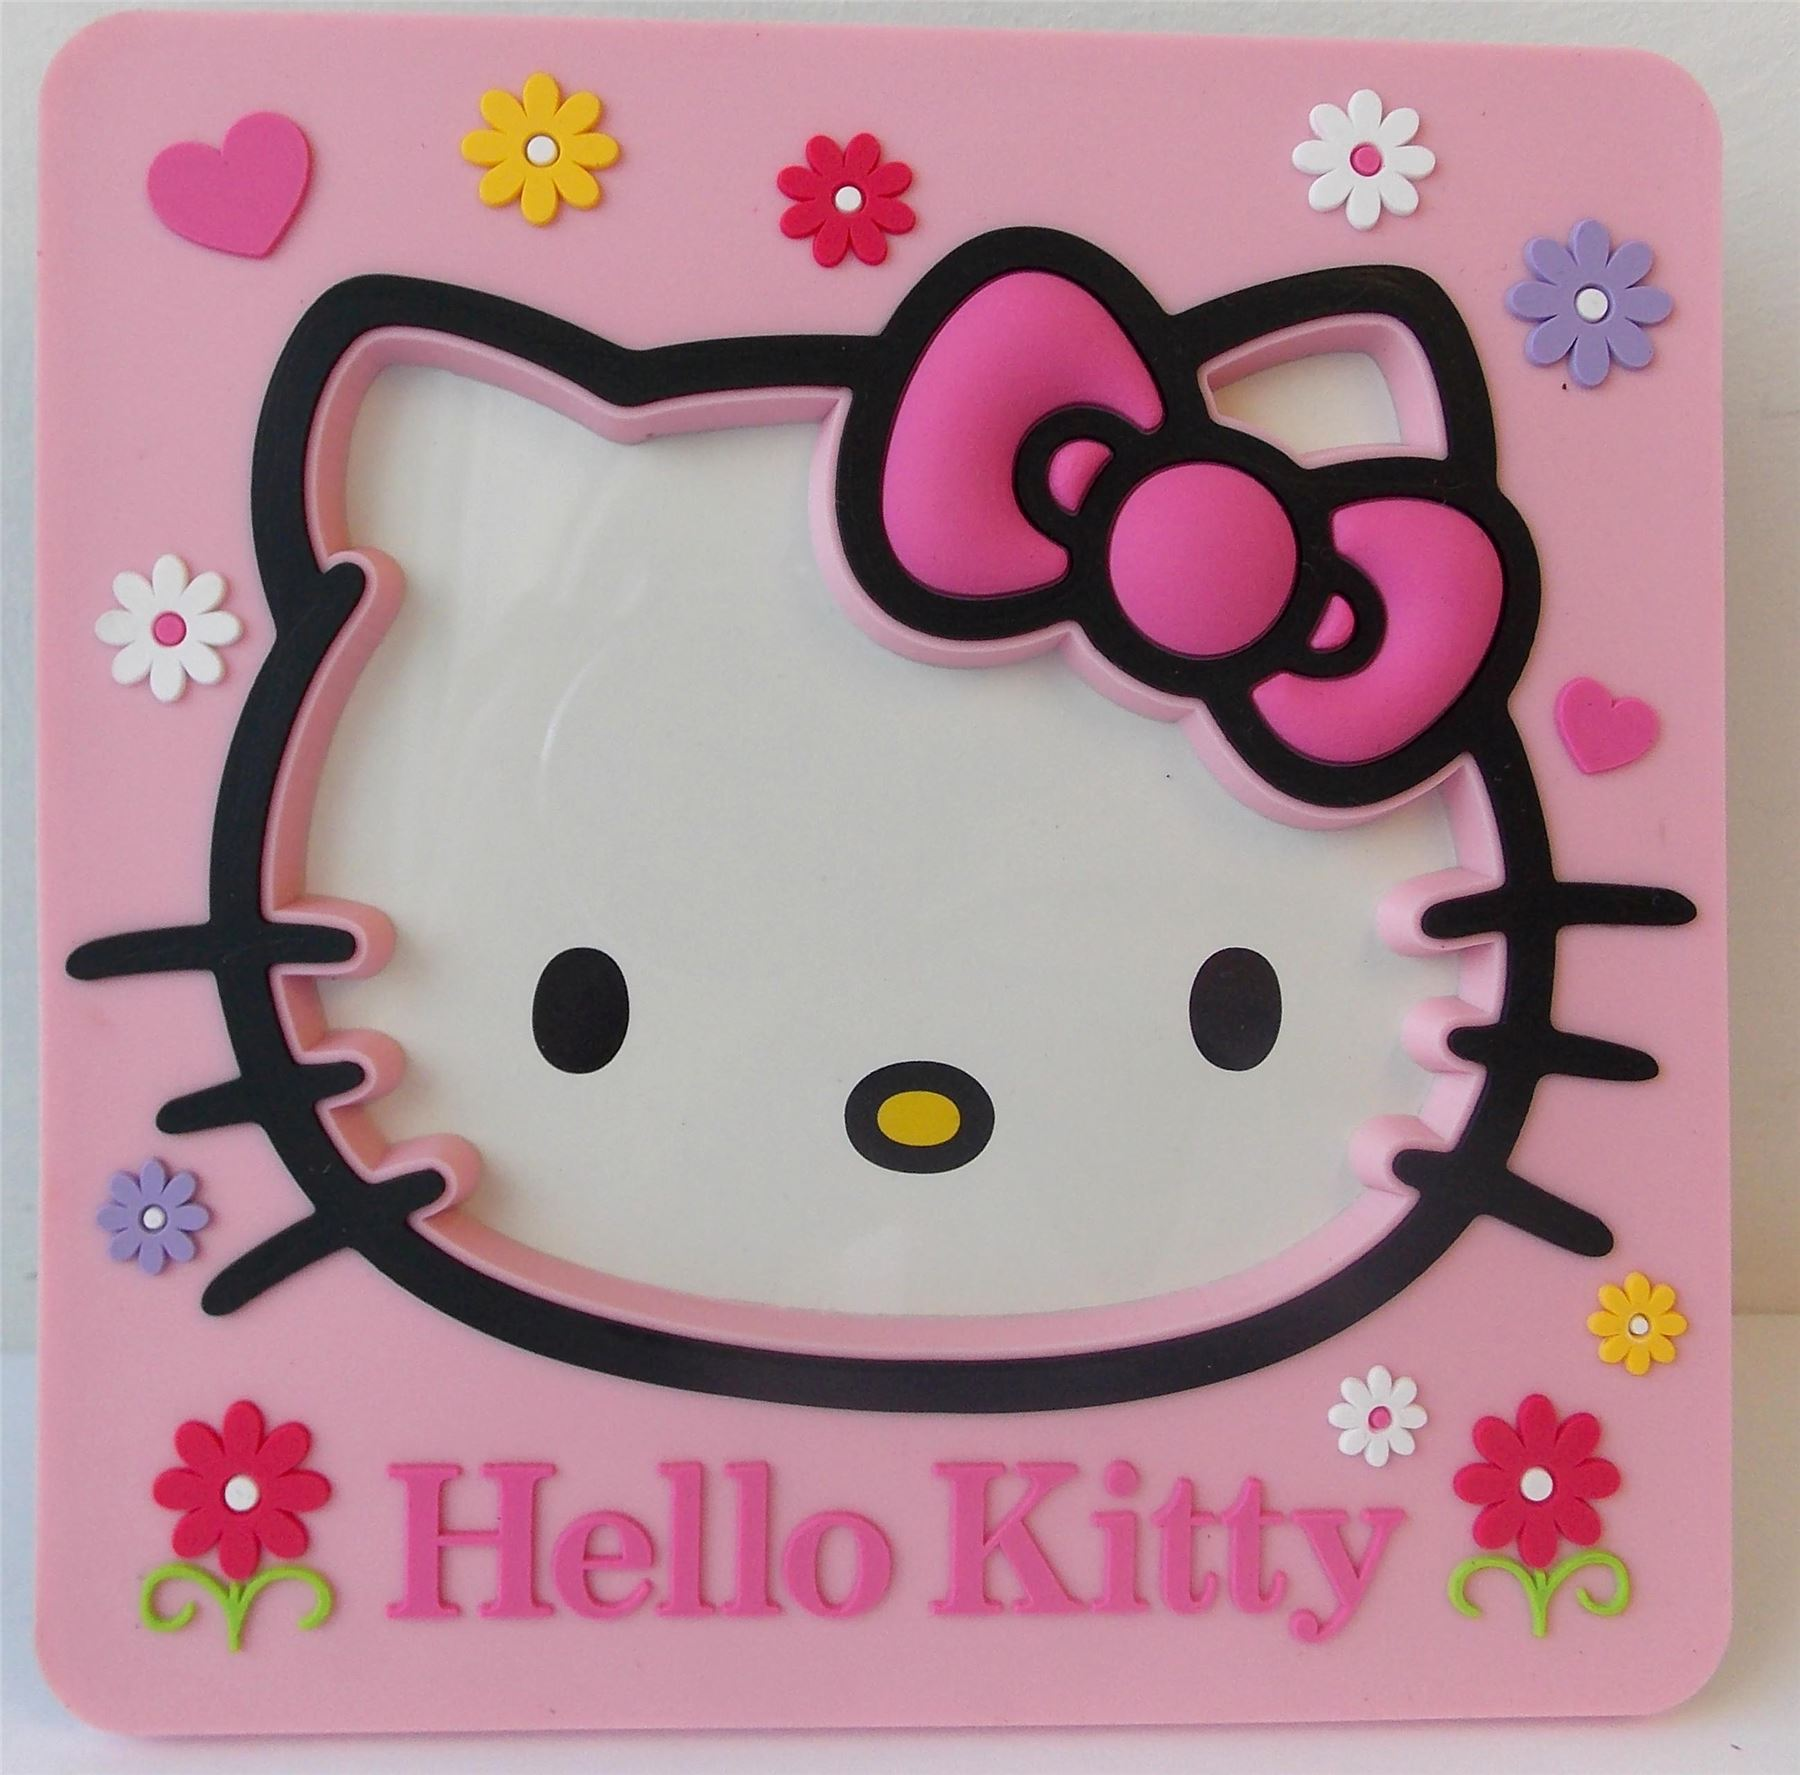 hello kitty gardinen hello kitty garden iphone wallpaper. Black Bedroom Furniture Sets. Home Design Ideas